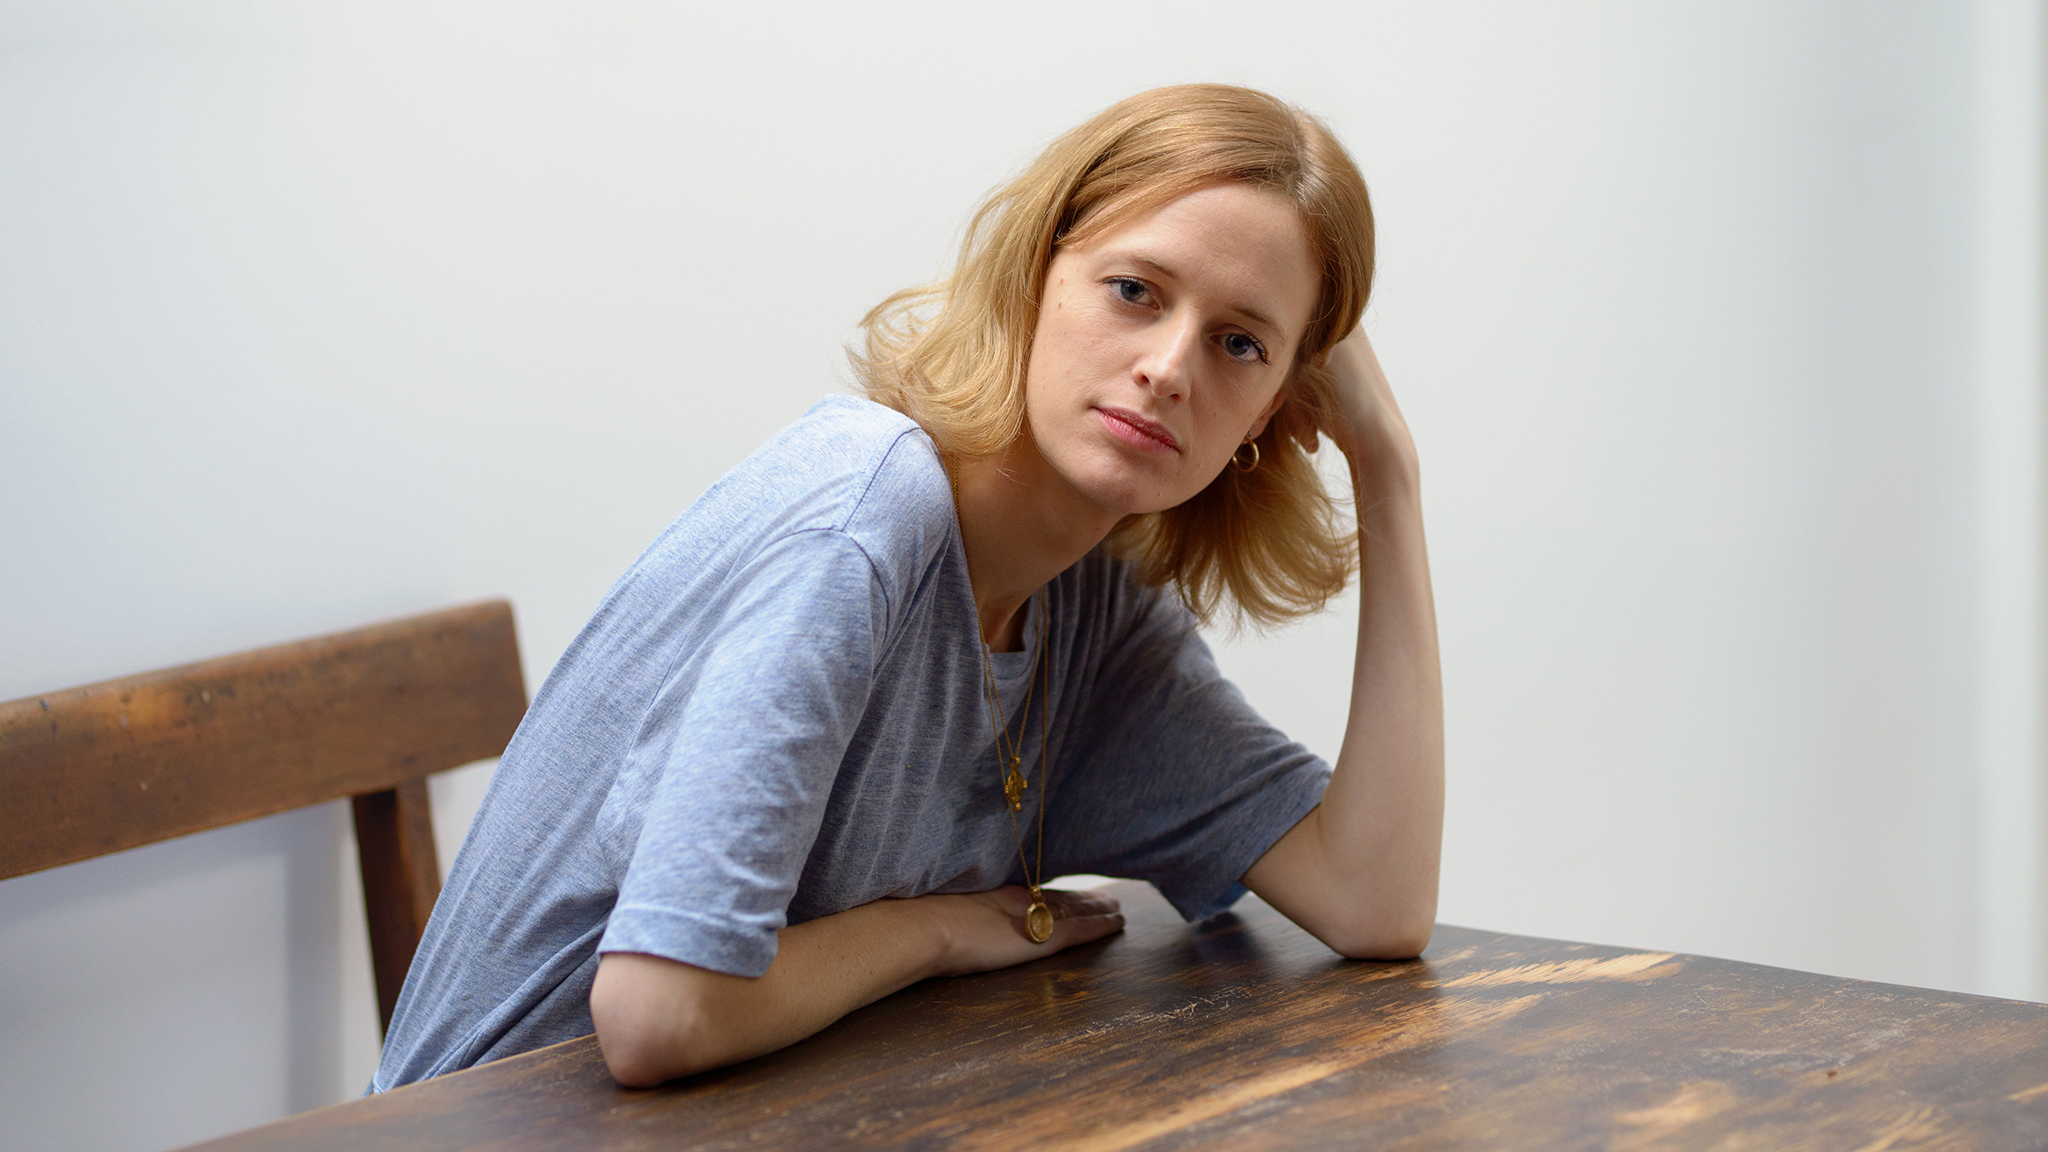 Isobel Waller-Bridge on fame, Phoebe and going from Fleabag to Austen